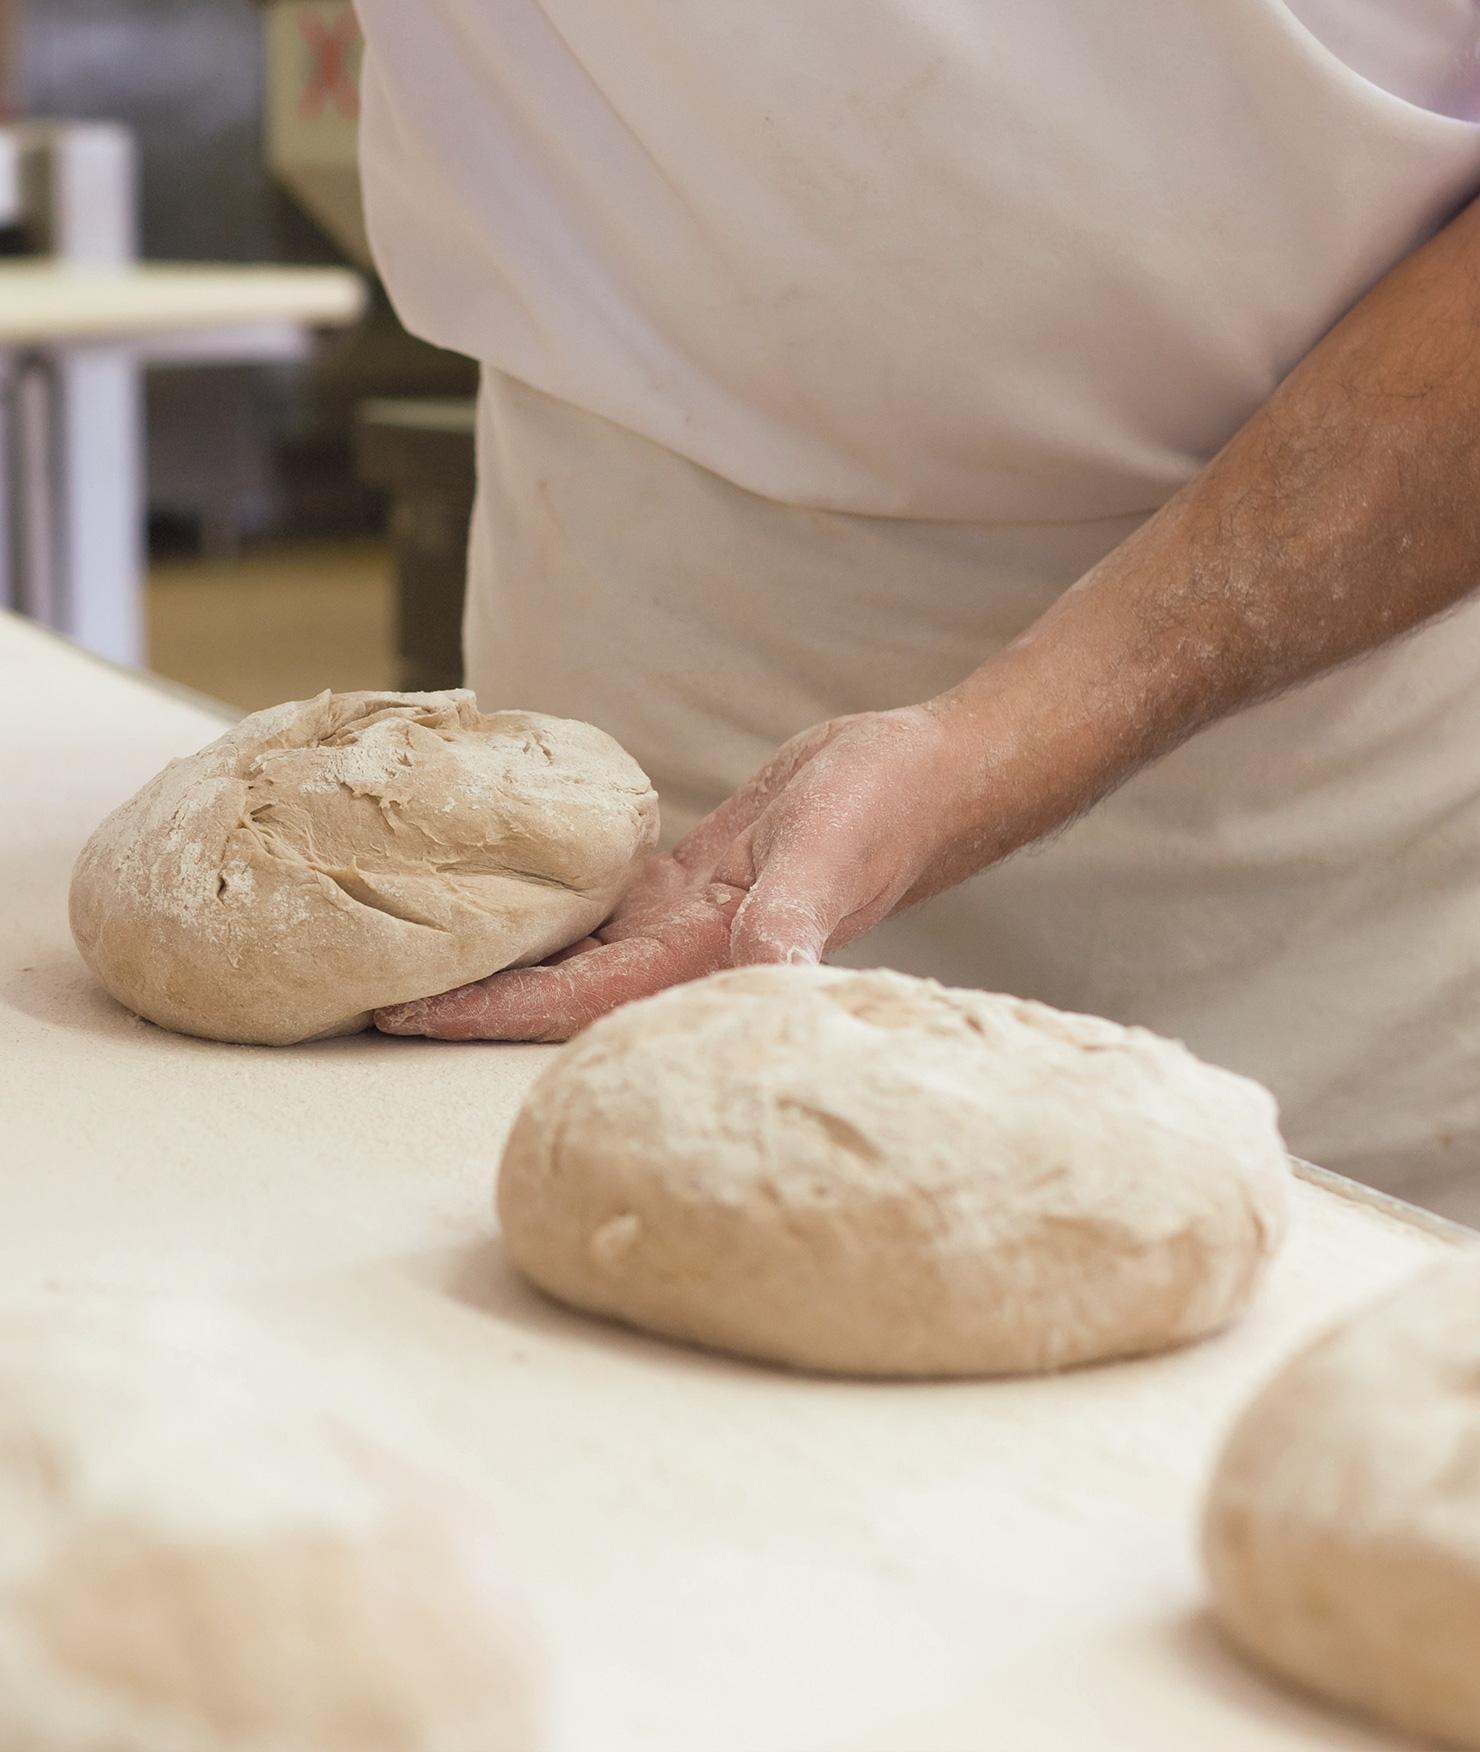 BRITA Filter PURITY C Steam Bäckerei Brot Detail